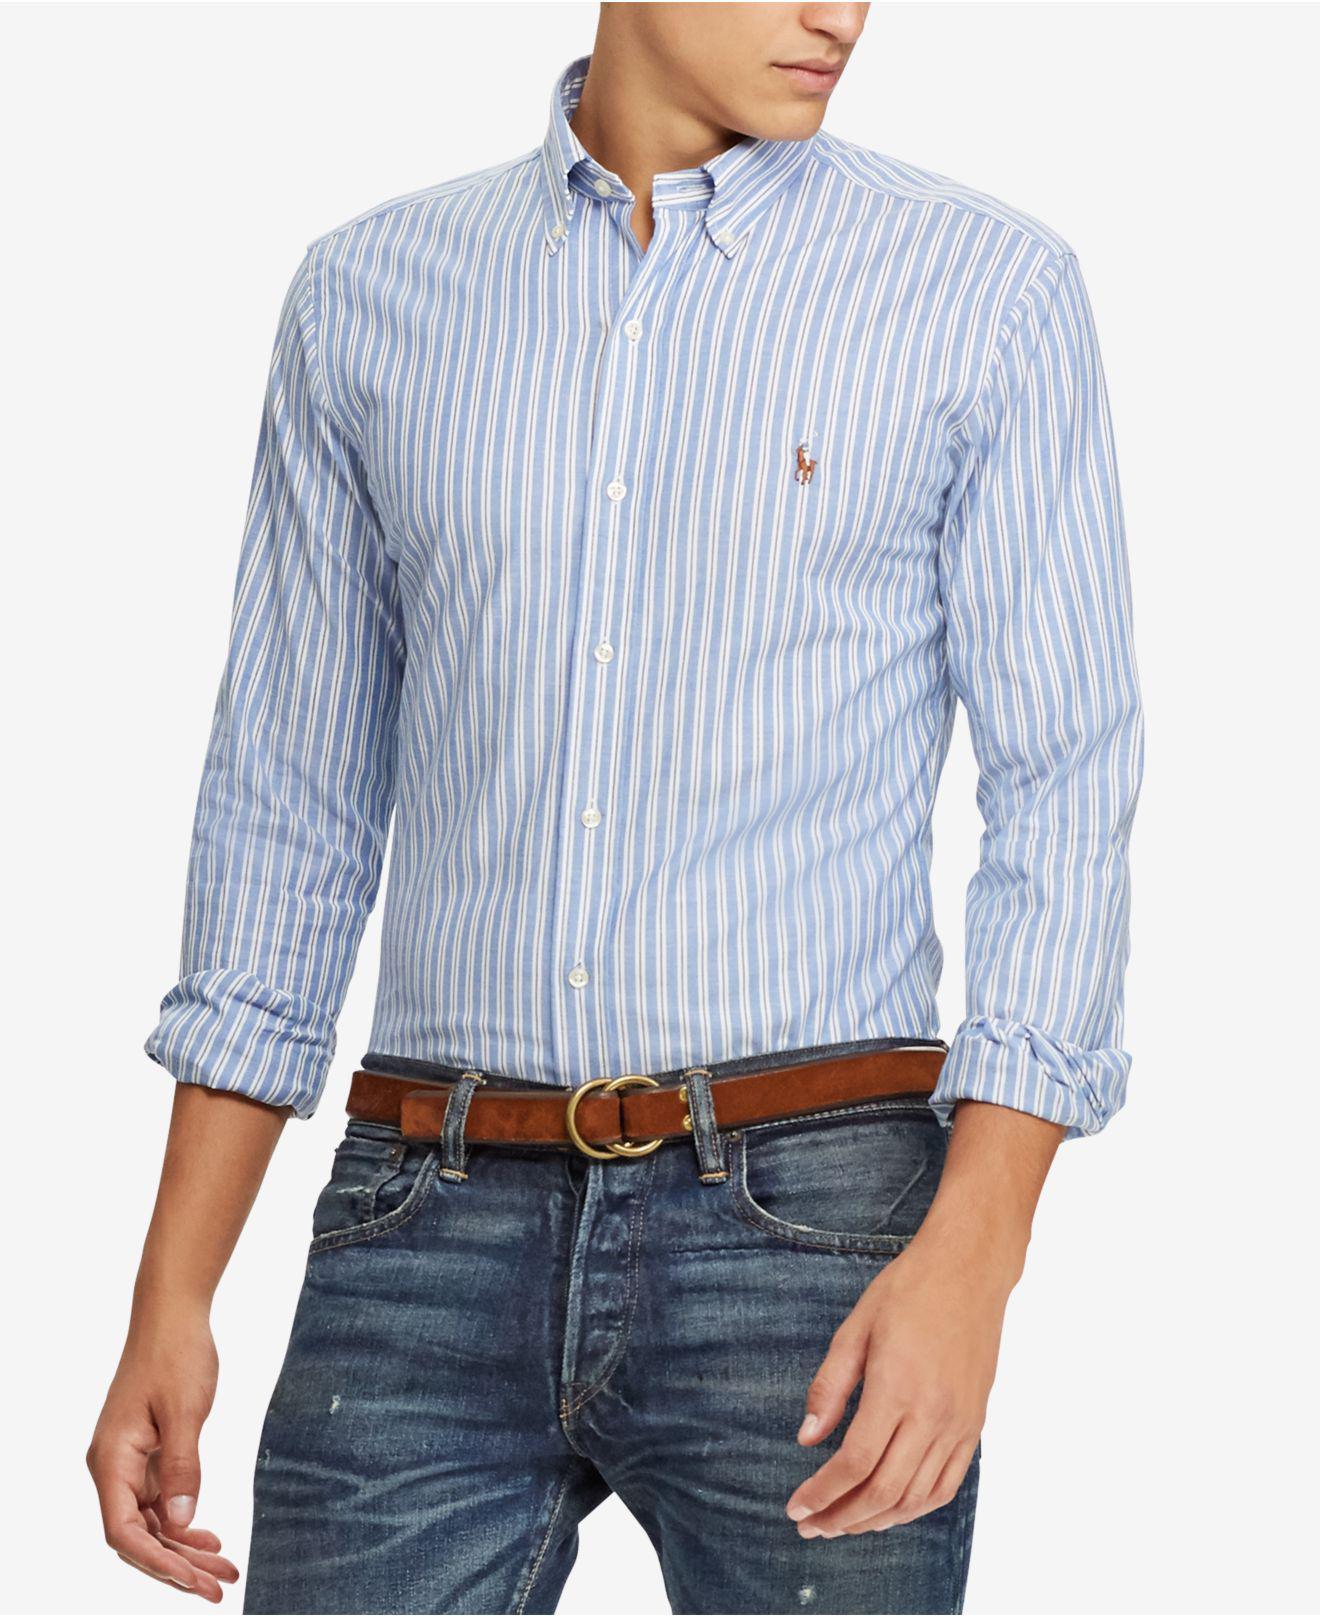 1c0598180eb Lyst - Polo Ralph Lauren Slim-fit Stripe Oxford Stretch Long-sleeve ...